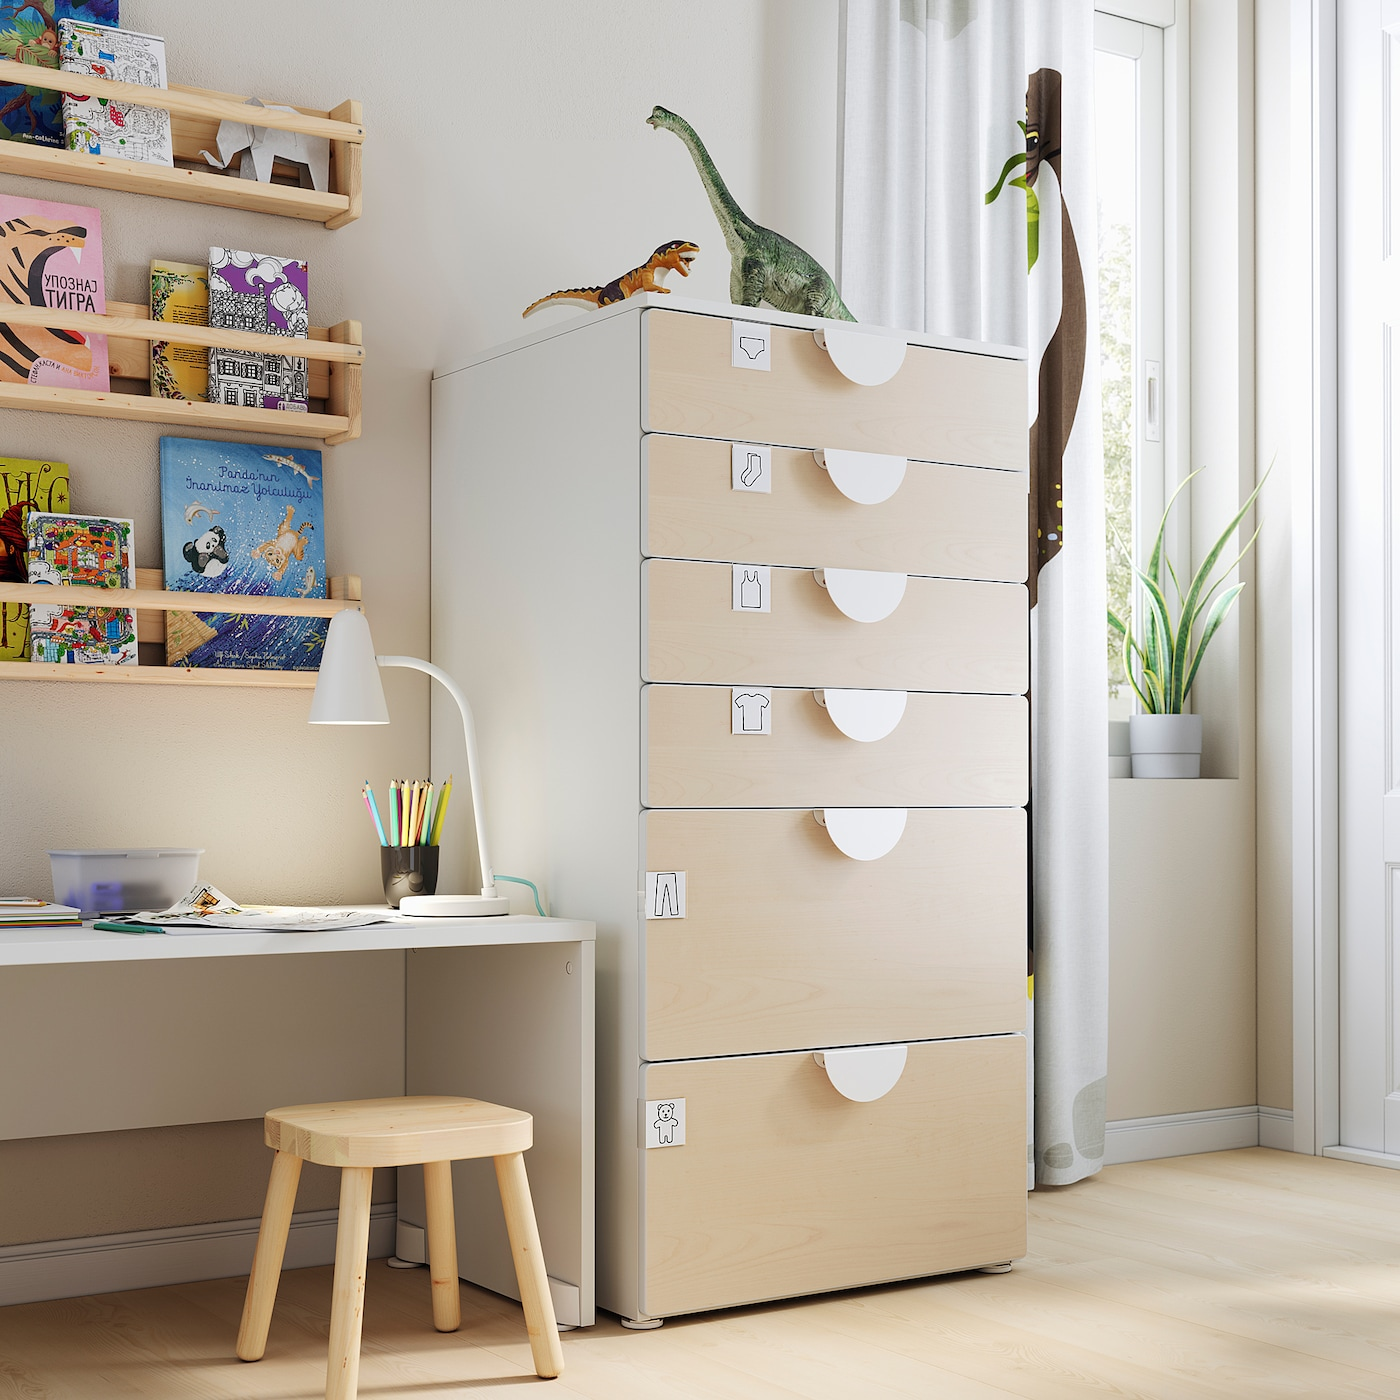 SMÅSTAD / PLATSA Komoda se 6 zásuvkami, bílá/bříza, 60x55x123 cm